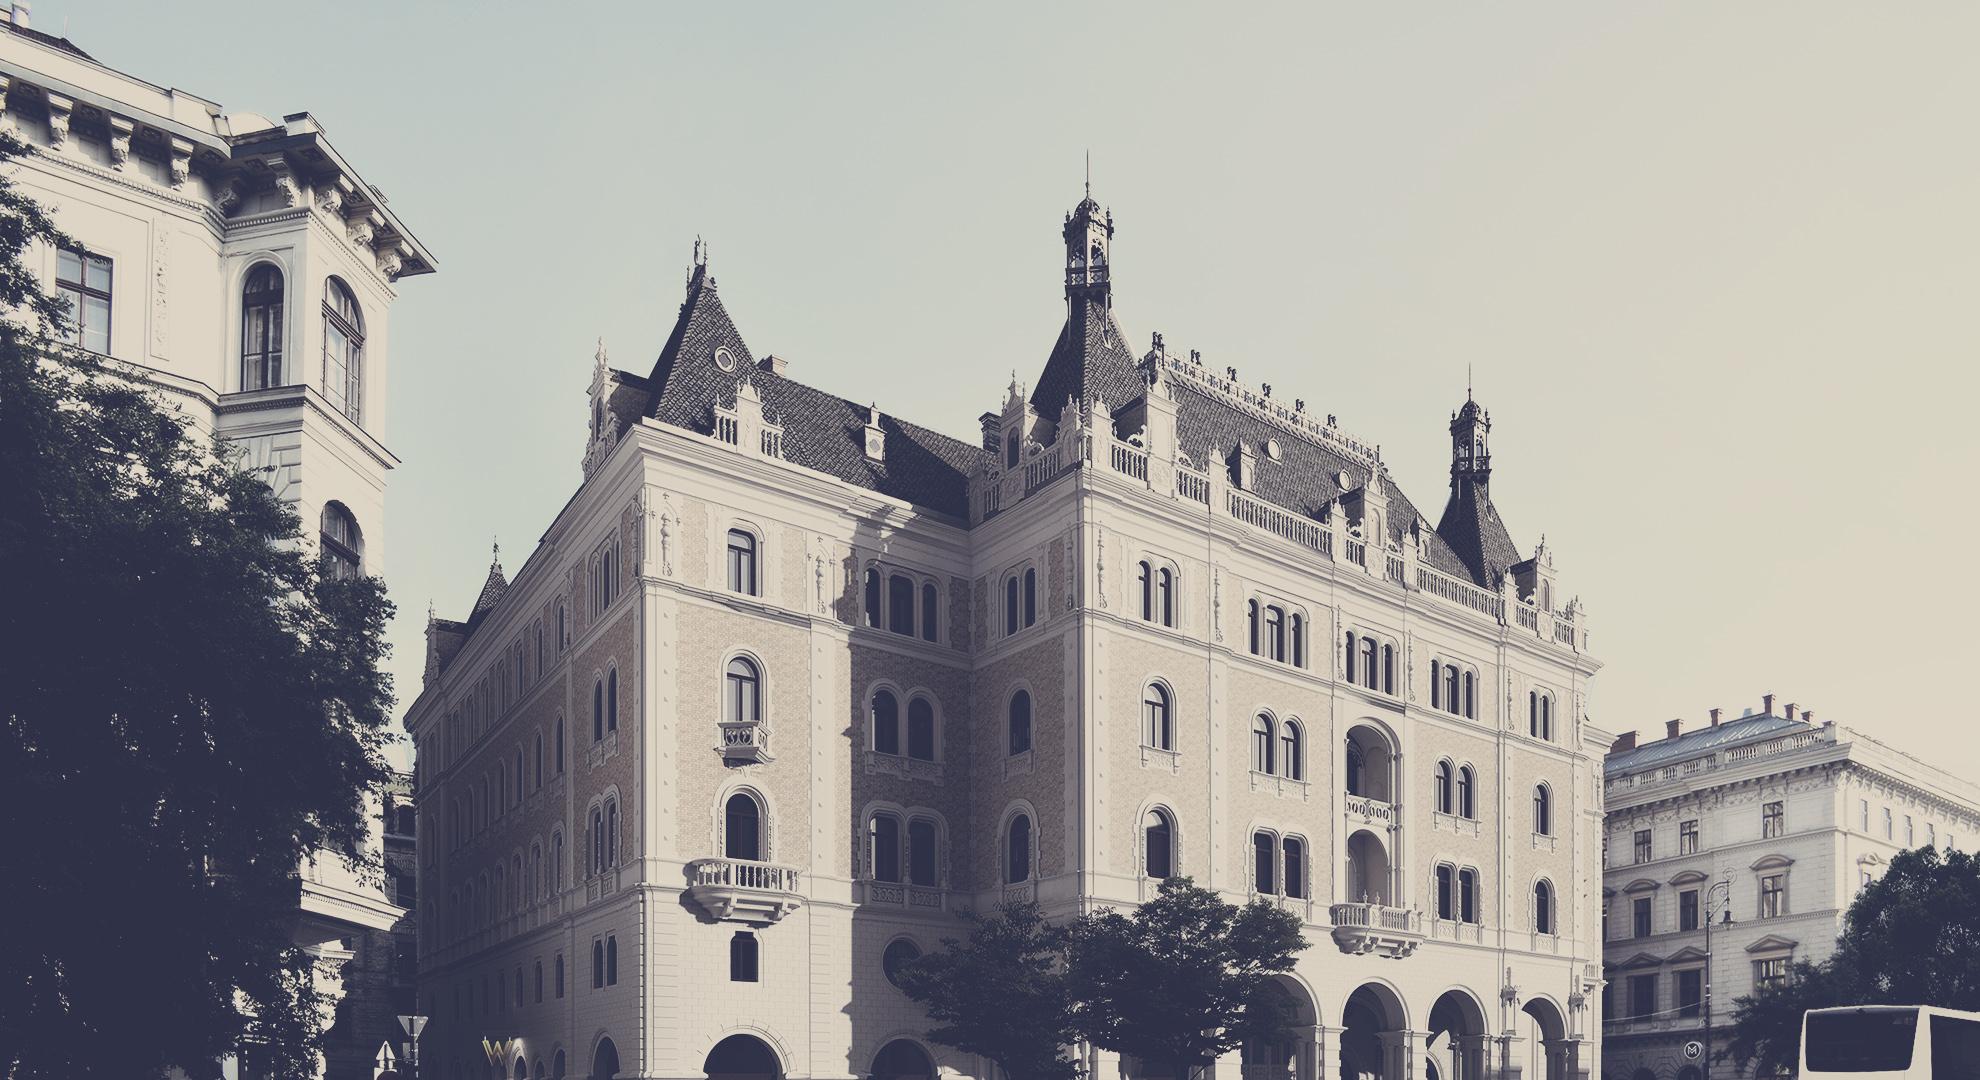 DRECHSLER PALACE – W BUDAPEST